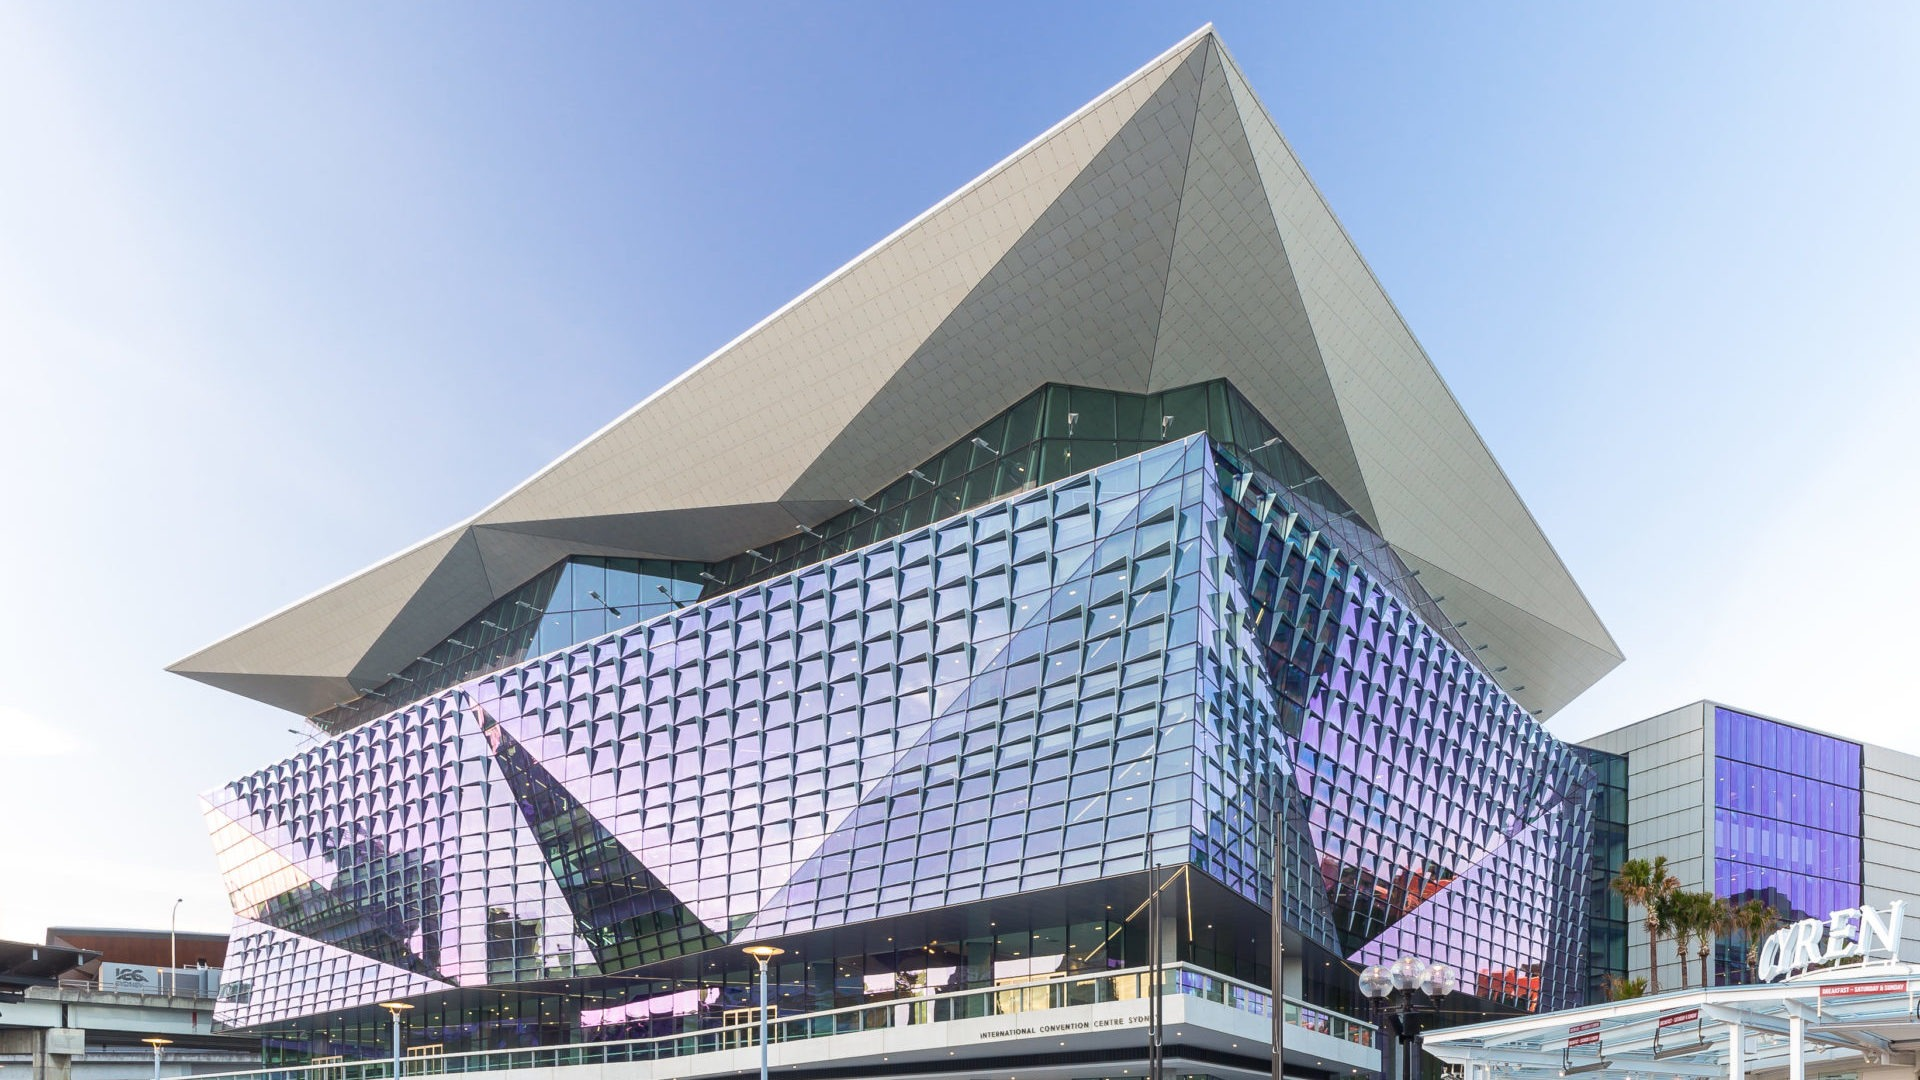 exhibition stand design company in Rotterdam